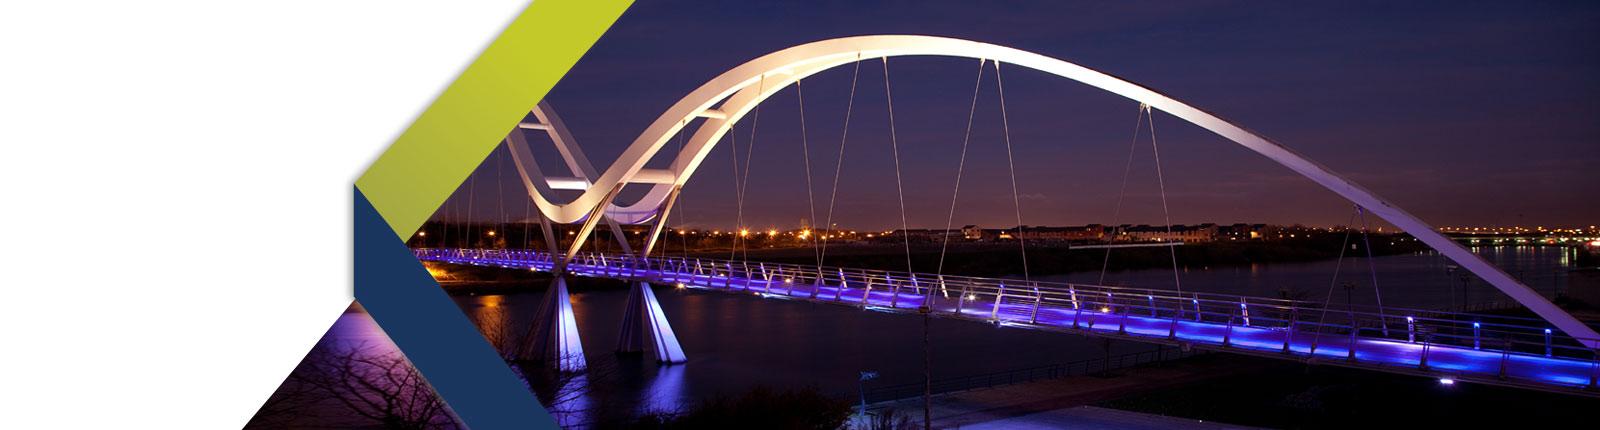 banner-bridge